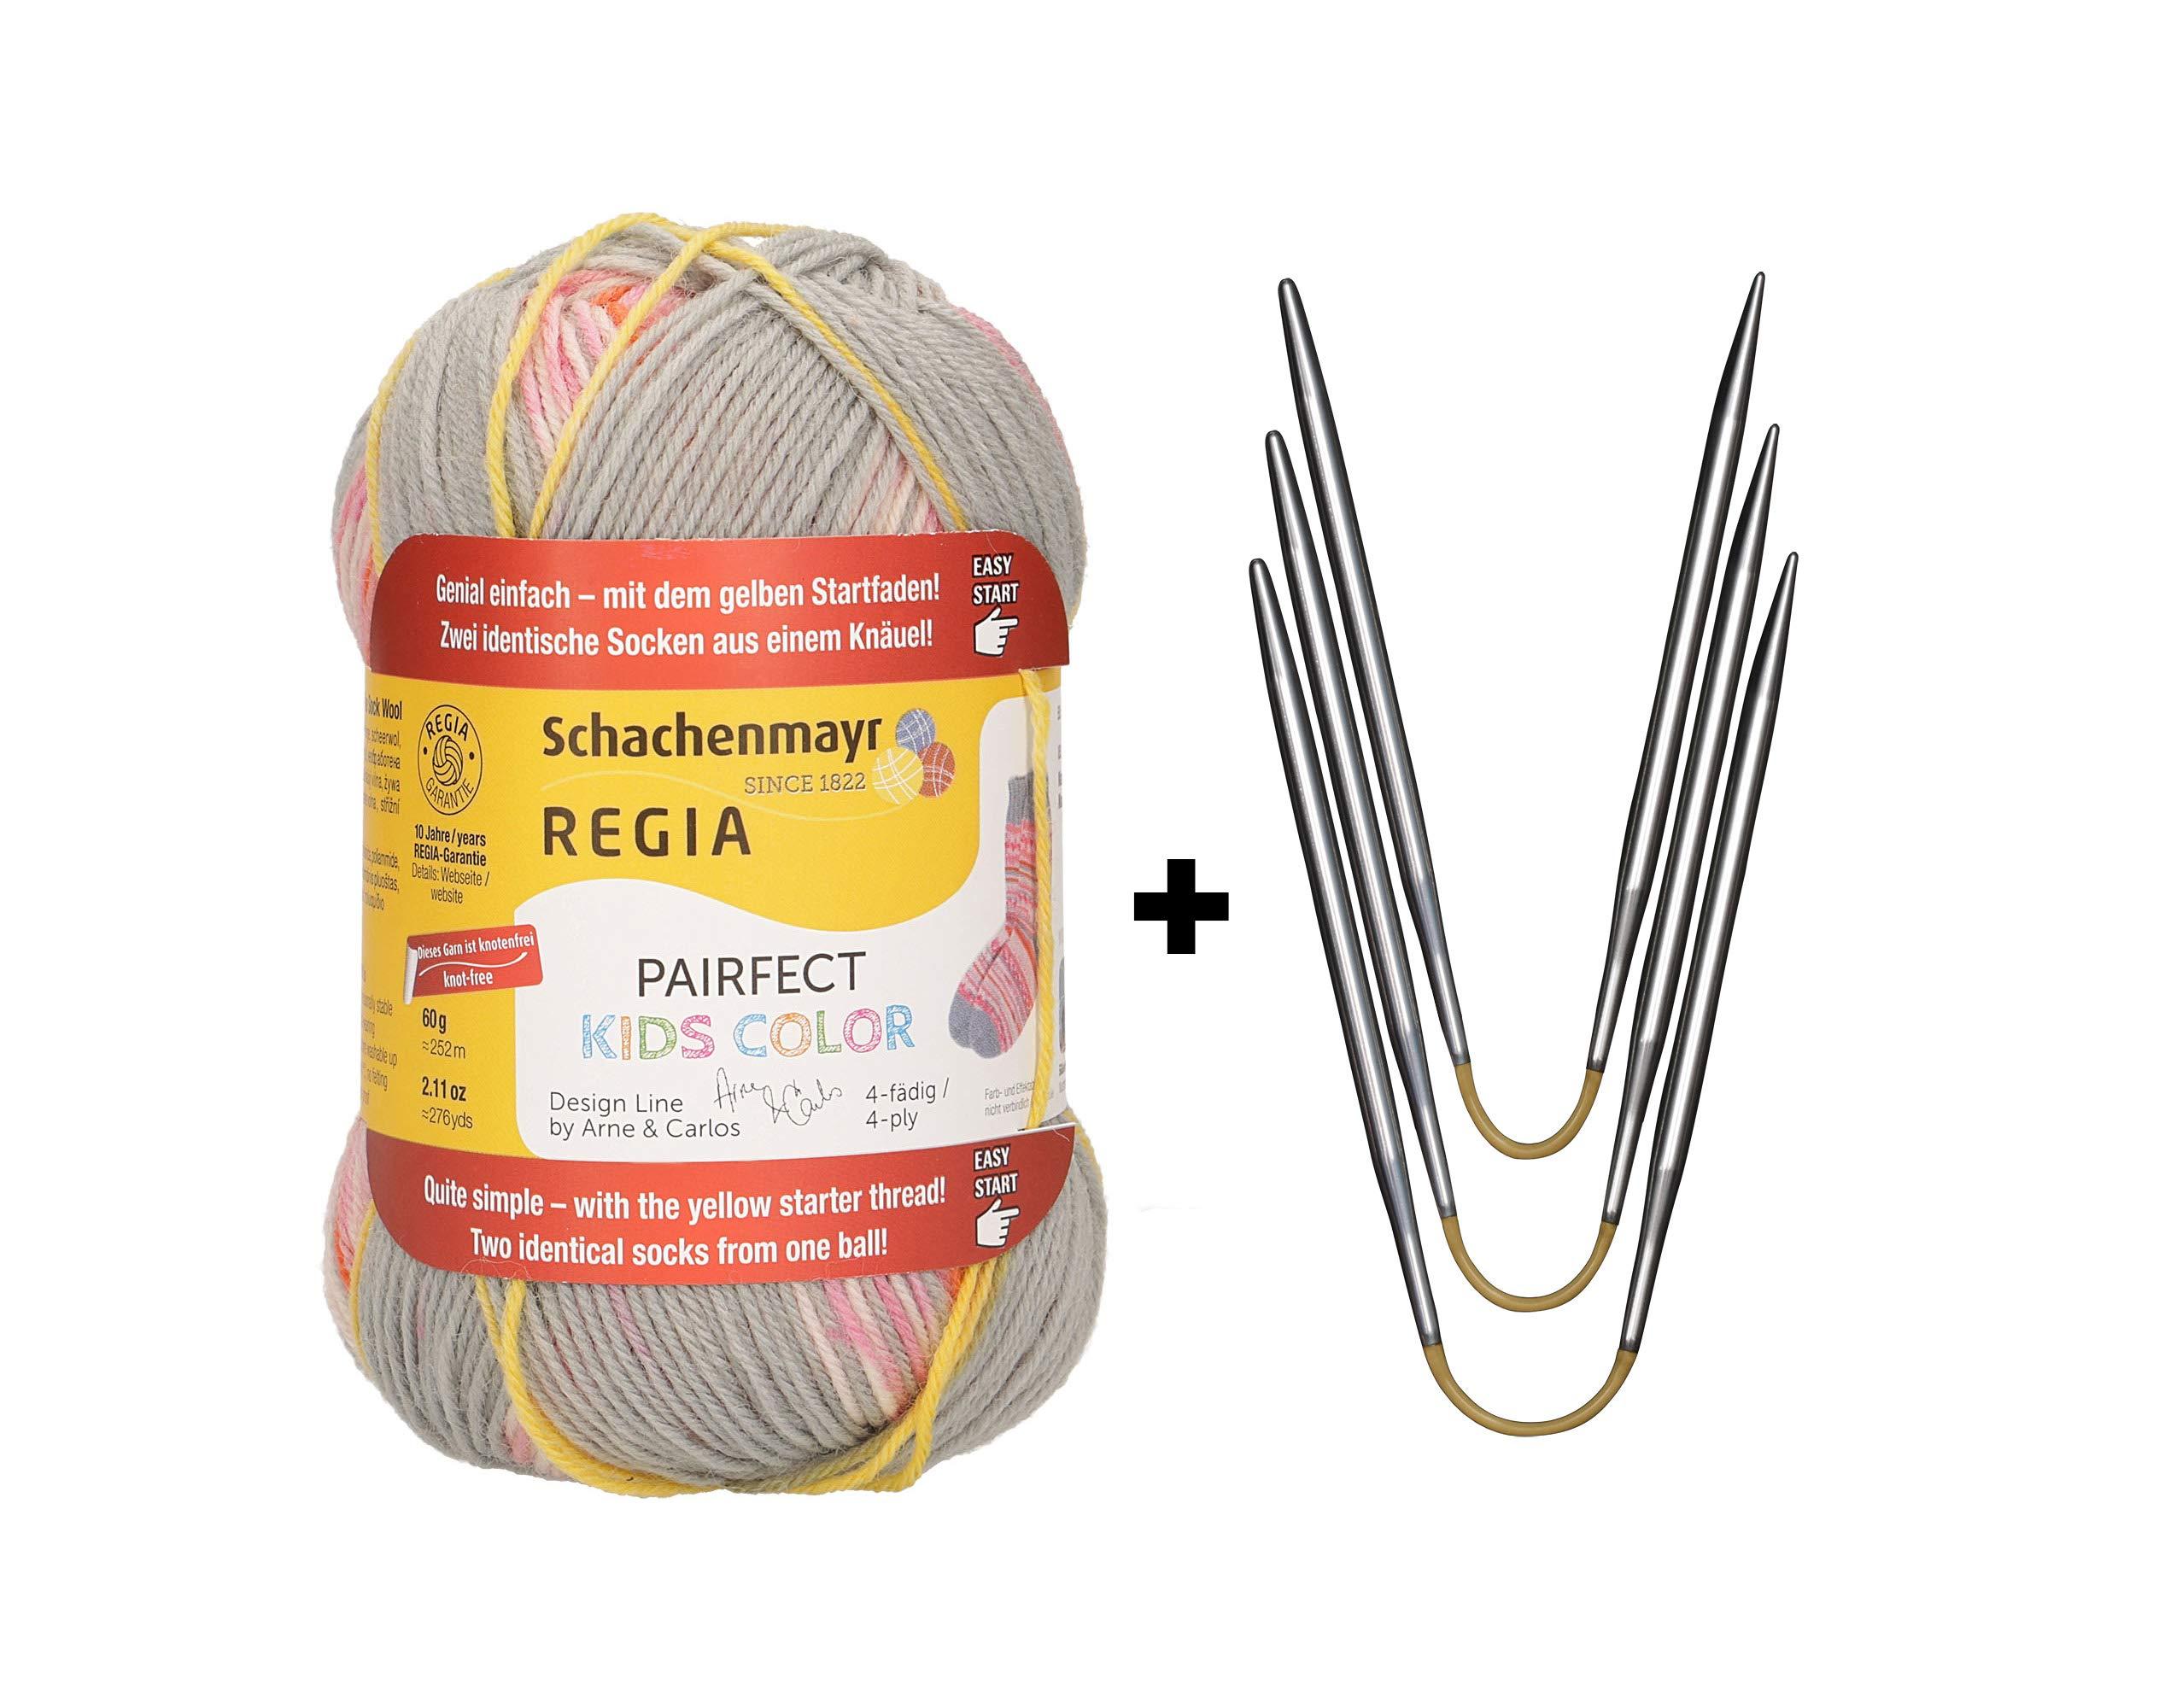 Sock Starter Kit addi CraSy Trio (US2.5/3mm) + REGIA Kids Color Pairfect (02983)